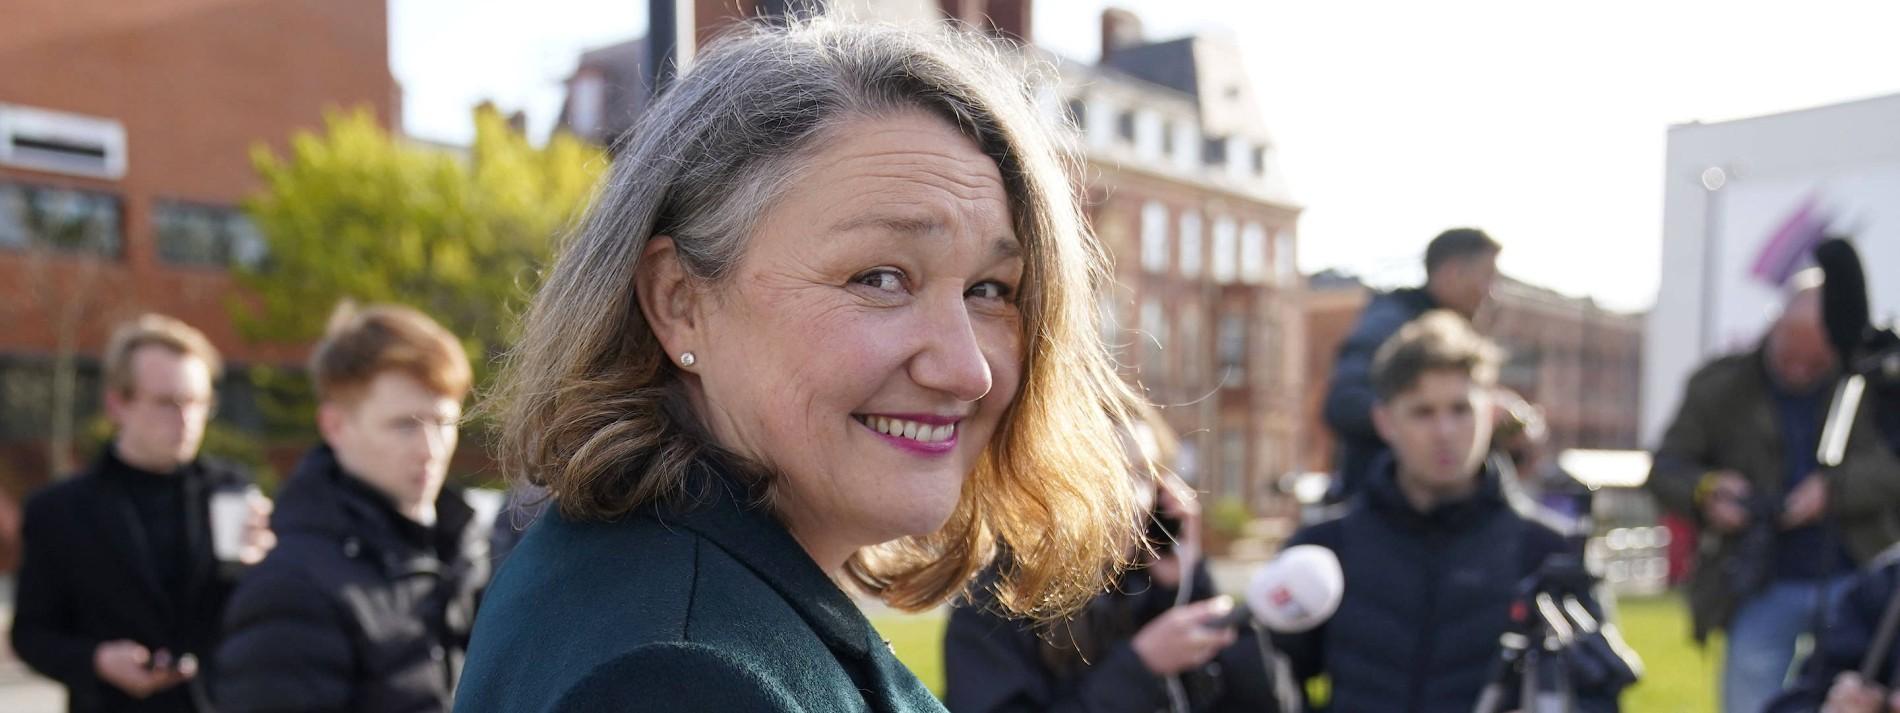 Konservative erringen historischen Wahlsieg in Hartlepool